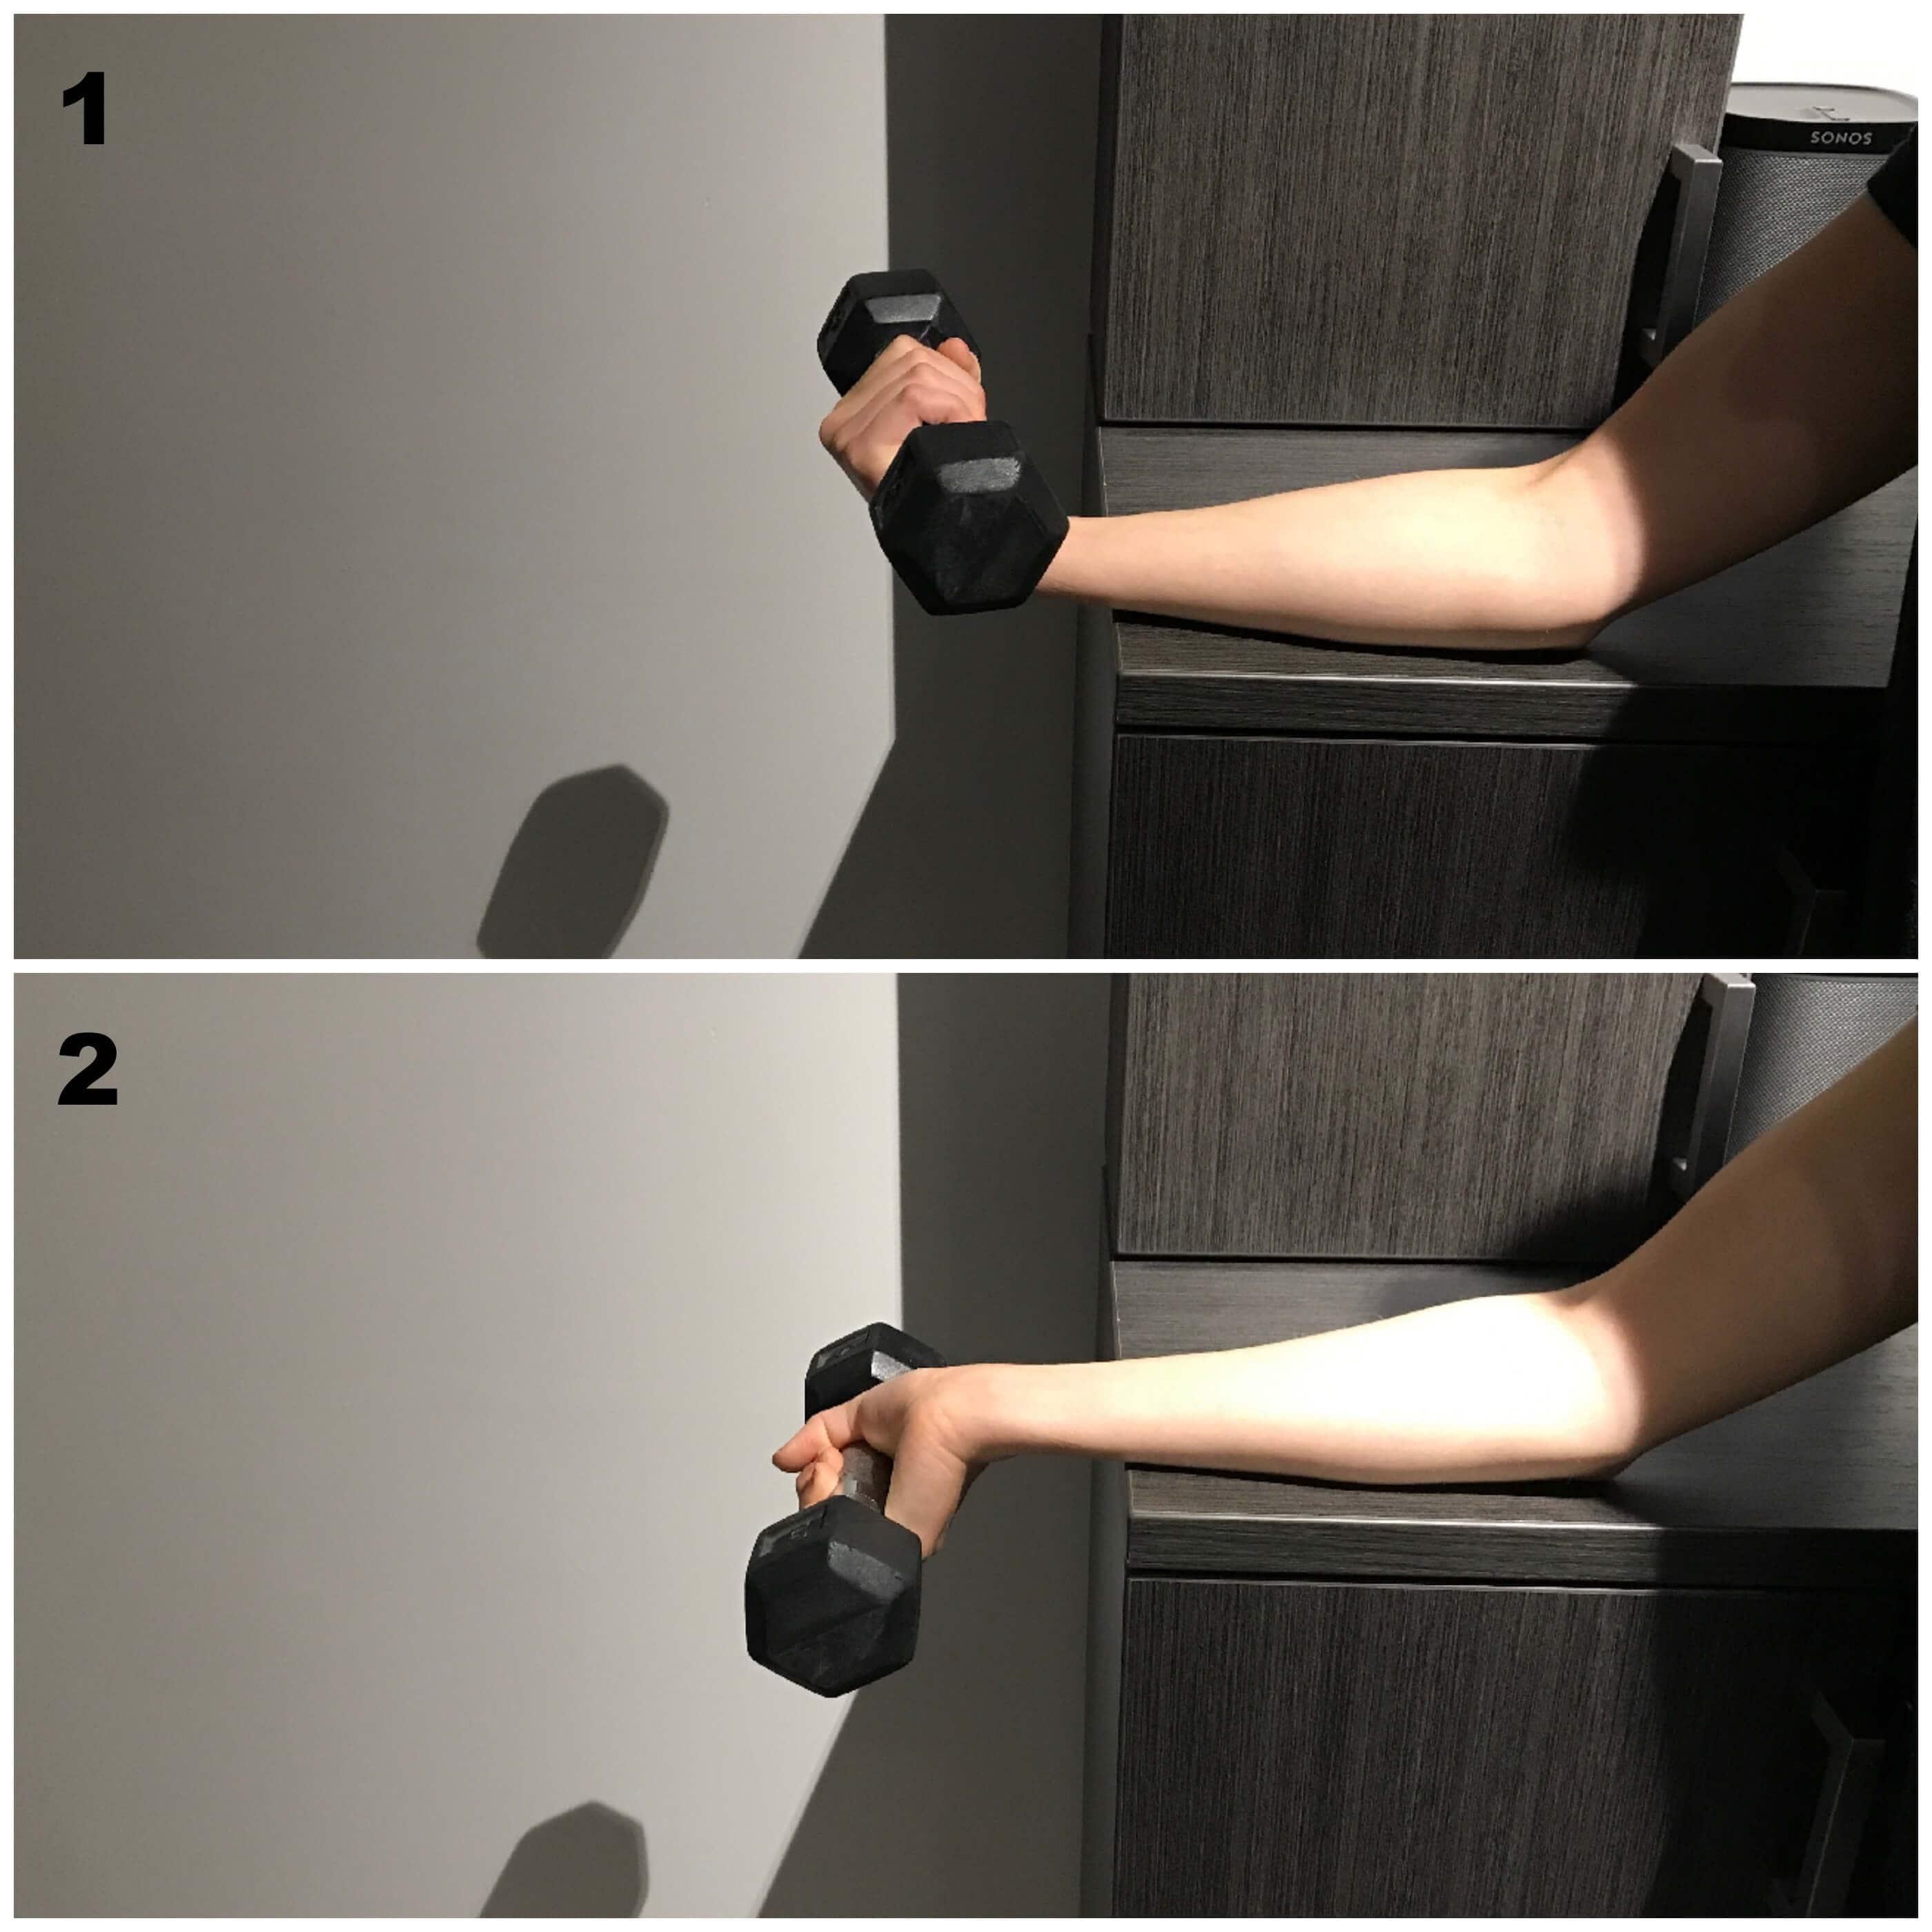 5 exercices simples pour soulager une pitrochl ite golfers elbow dr michael desbiens. Black Bedroom Furniture Sets. Home Design Ideas